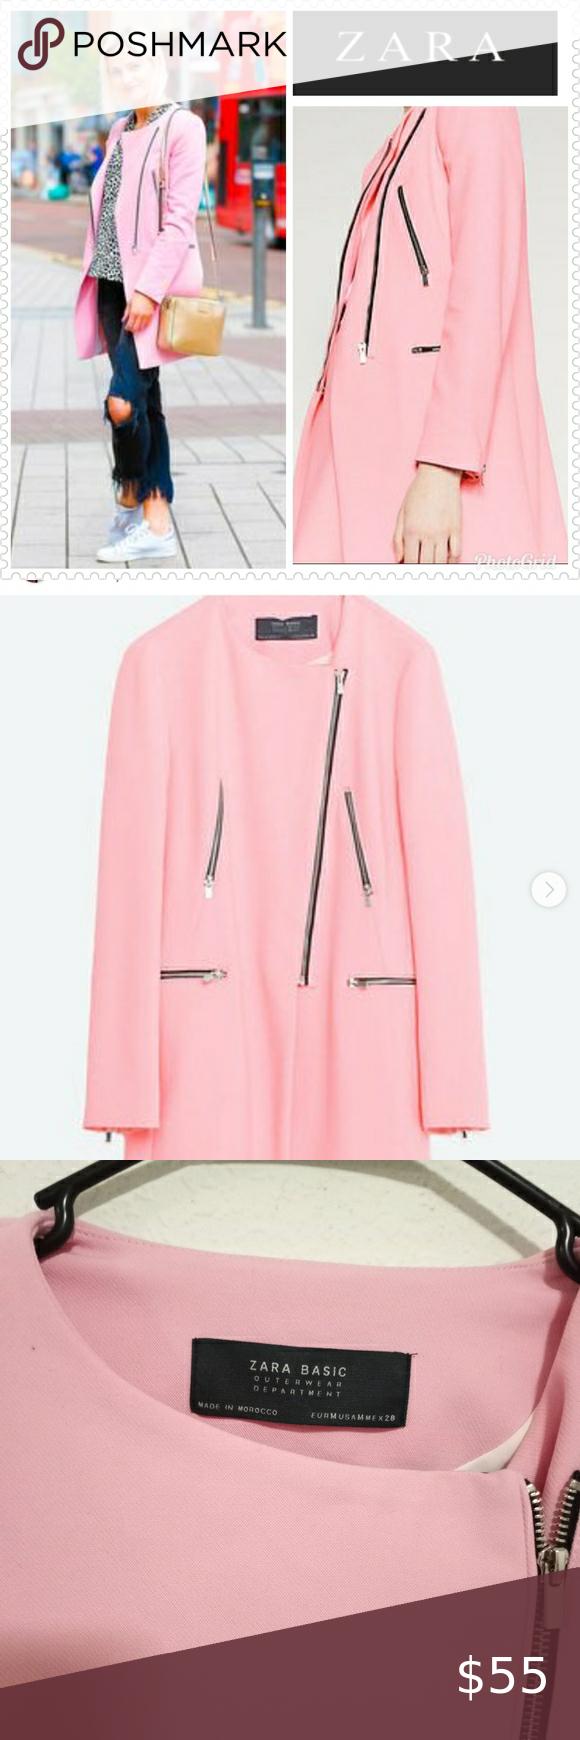 Zara Pink Round Neck Coat Zips Jacket Sz M Pink Jacket Blazer Zara Pink Jacket [ 1740 x 580 Pixel ]